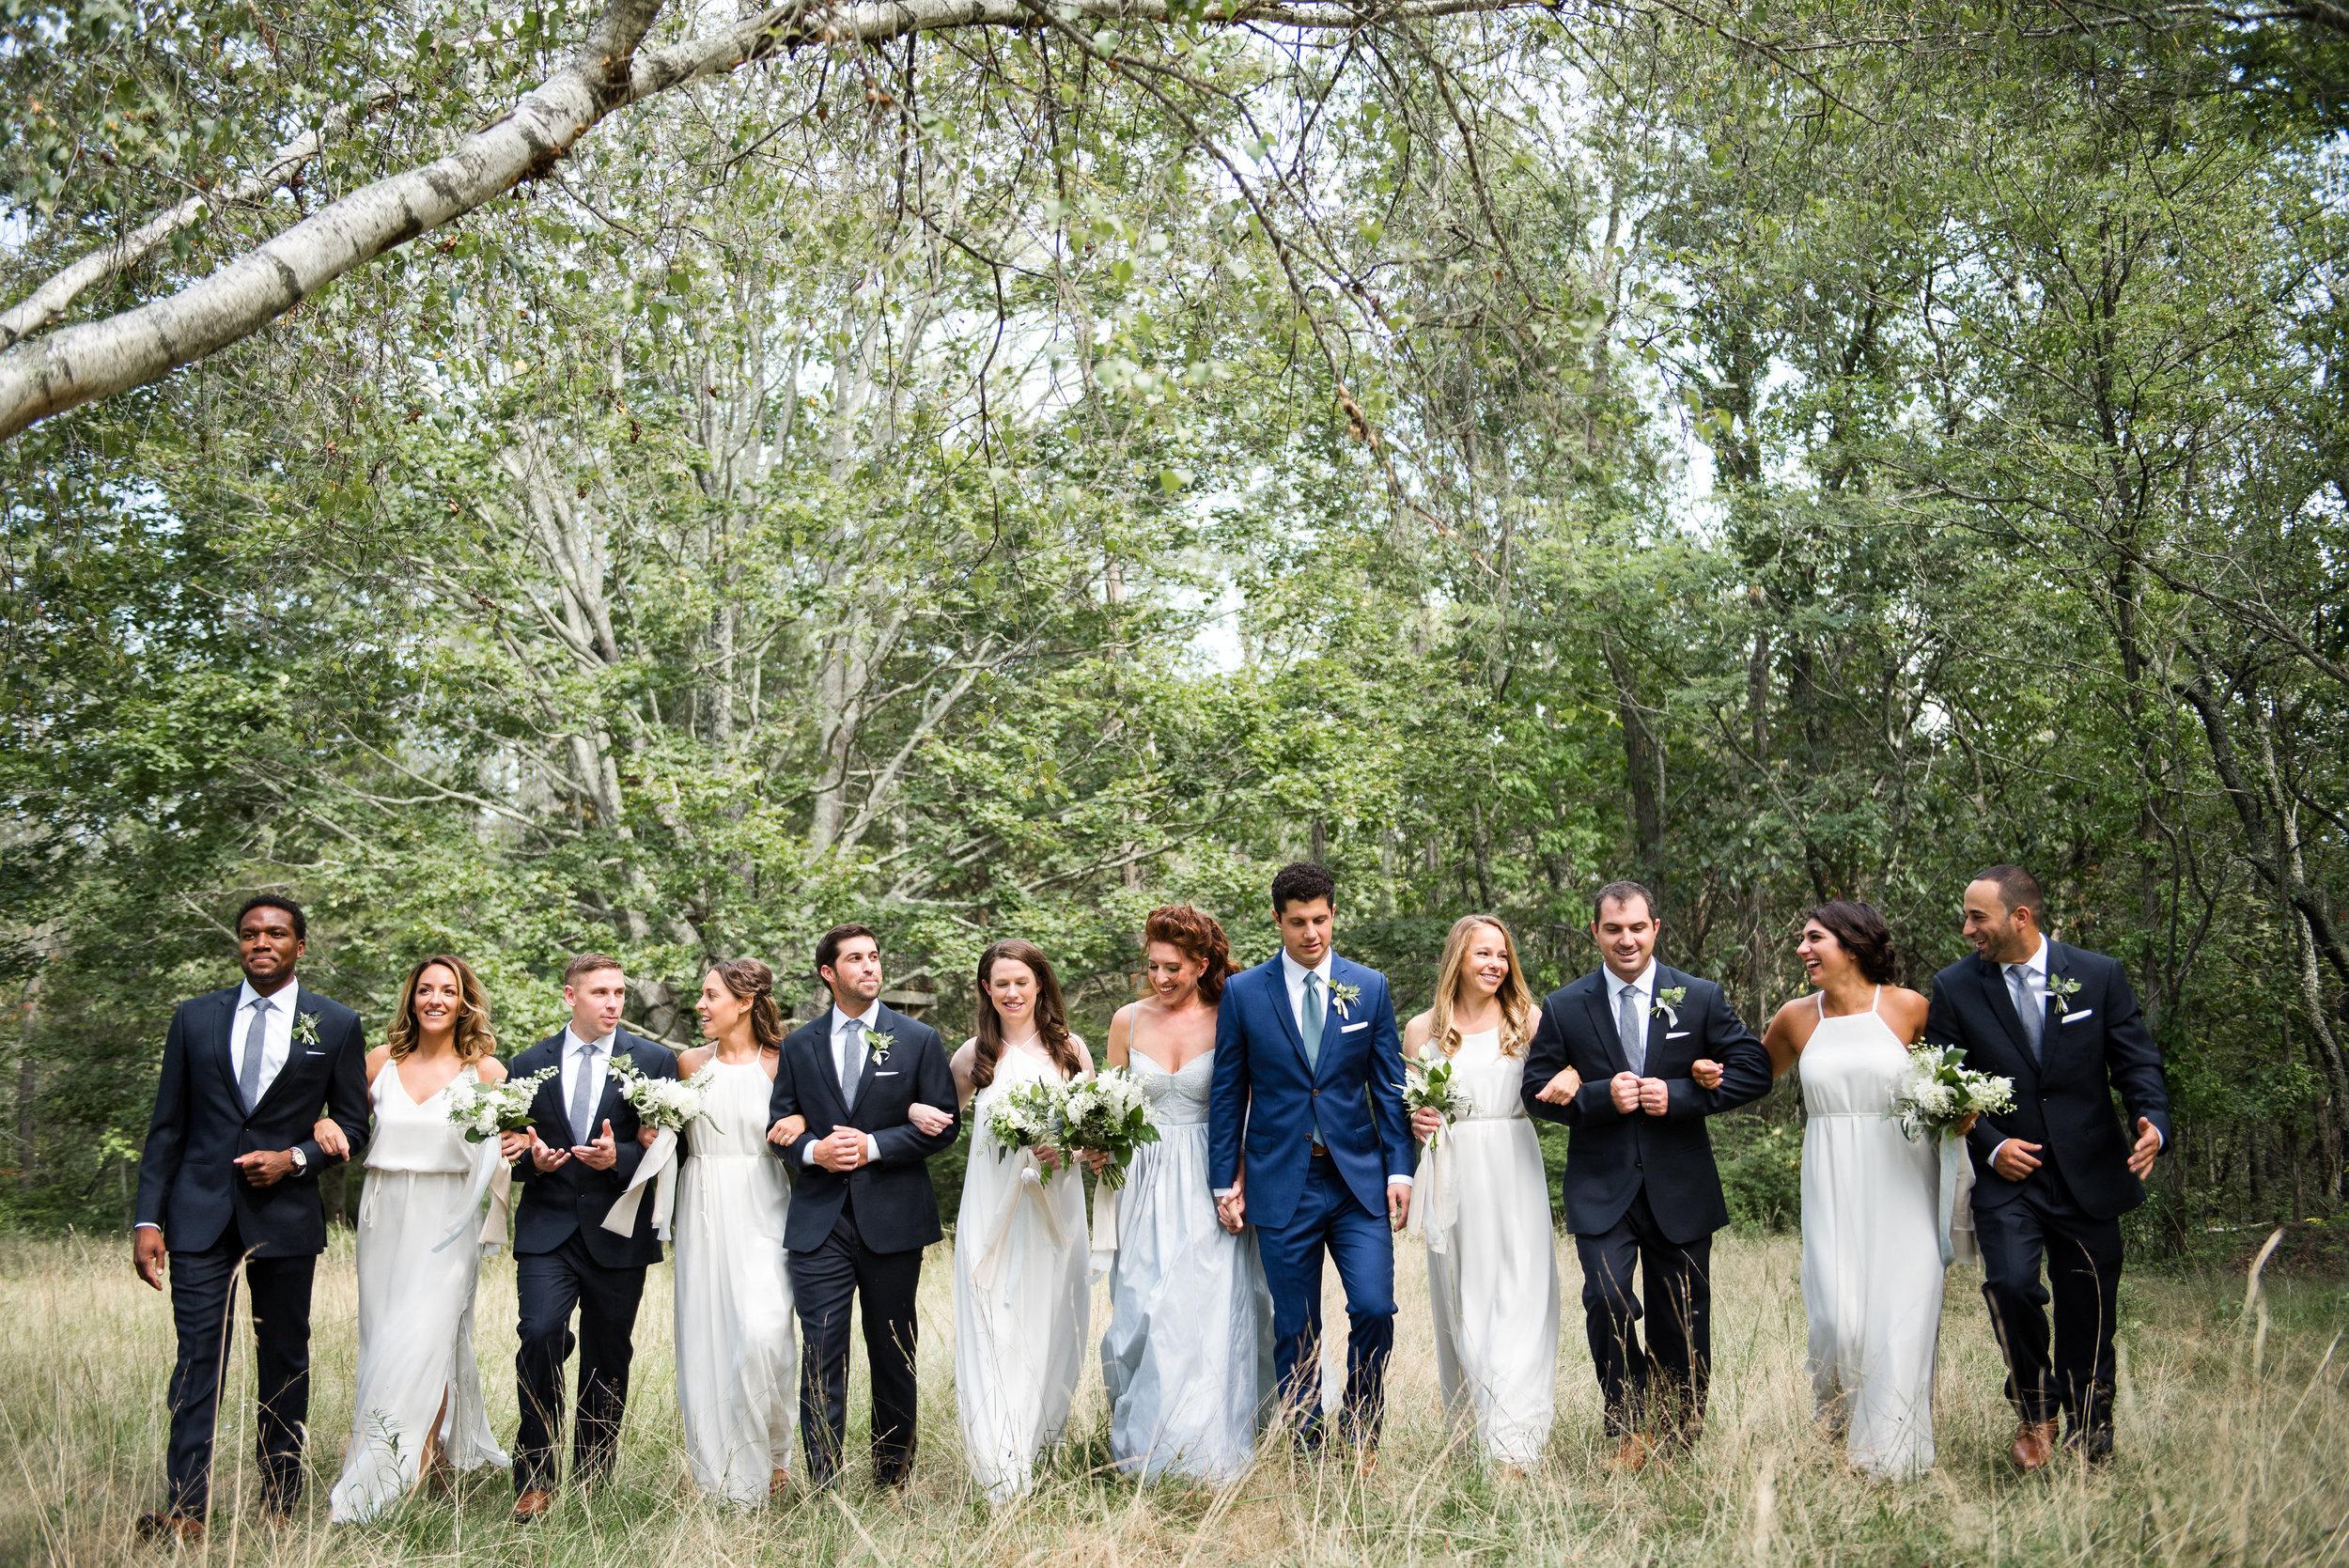 COPPER GEOMETRIC WEDDING LACE FACTORY WEDDING_007.jpg